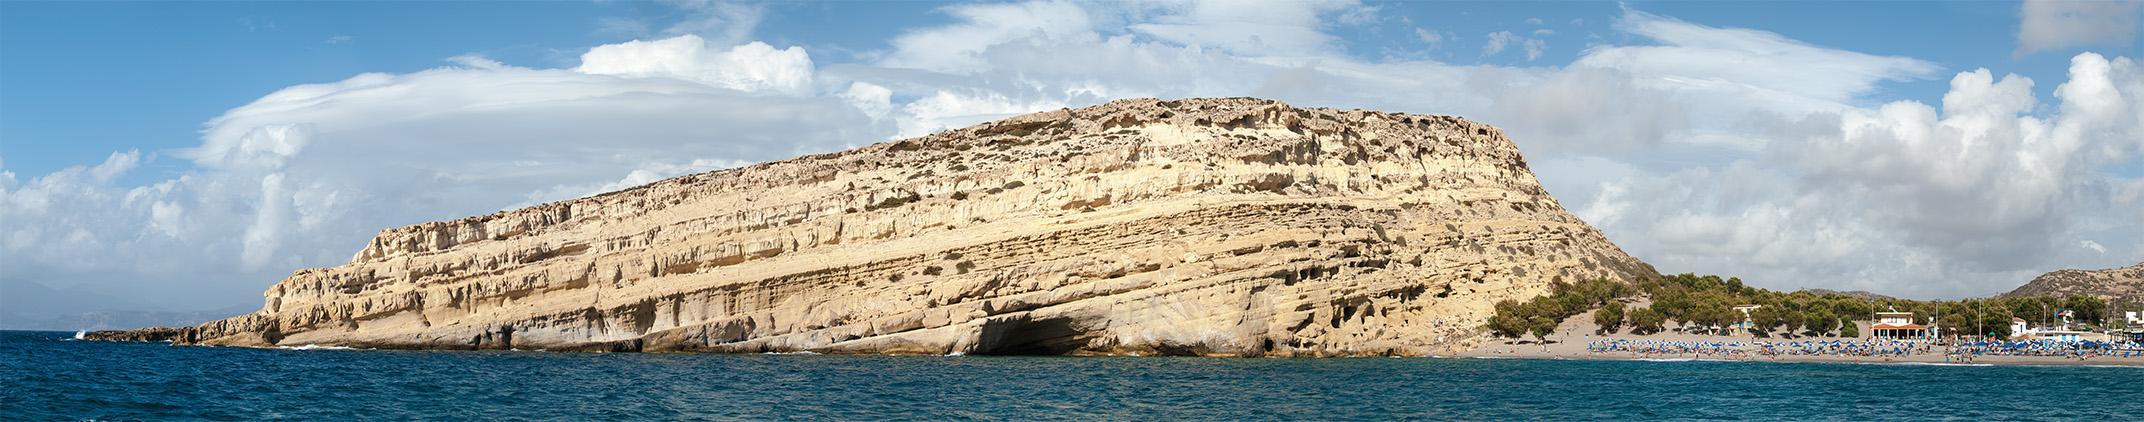 in Matala auf Kreta